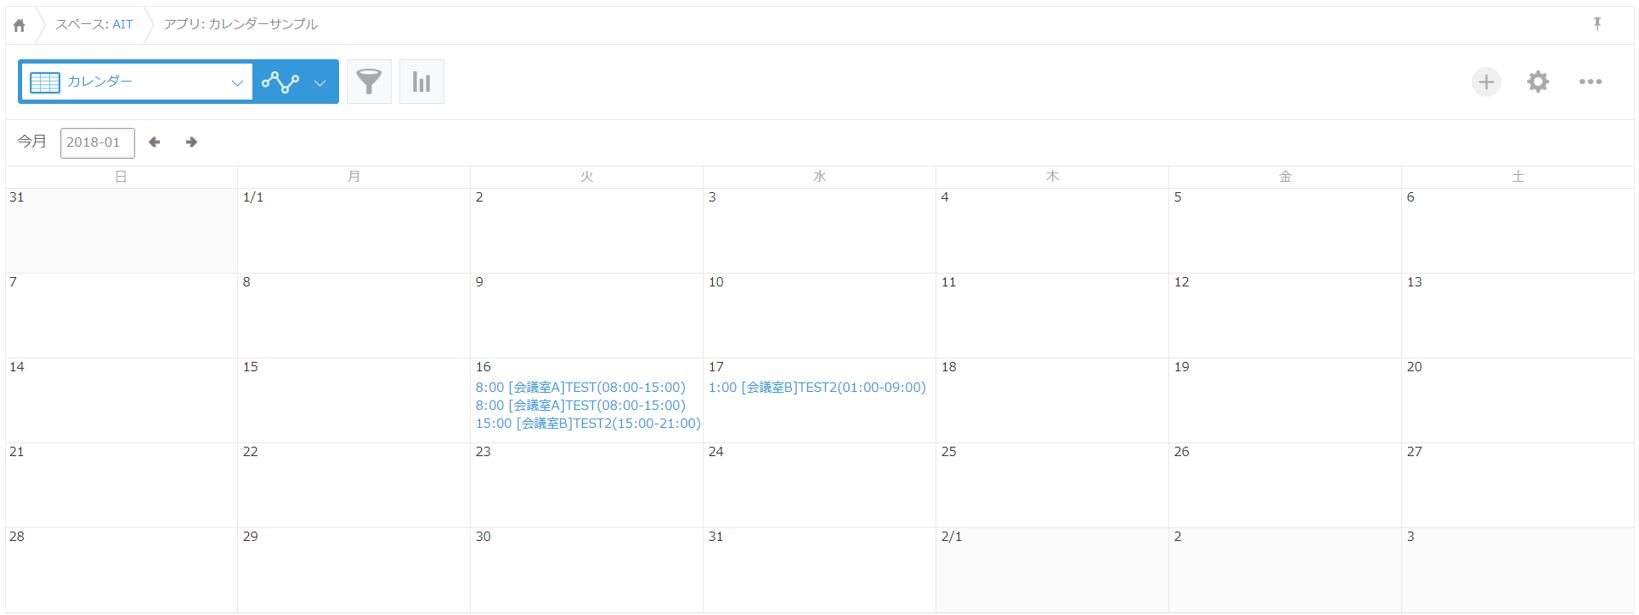 kintoneカレンダー形式表示(デフォルト)